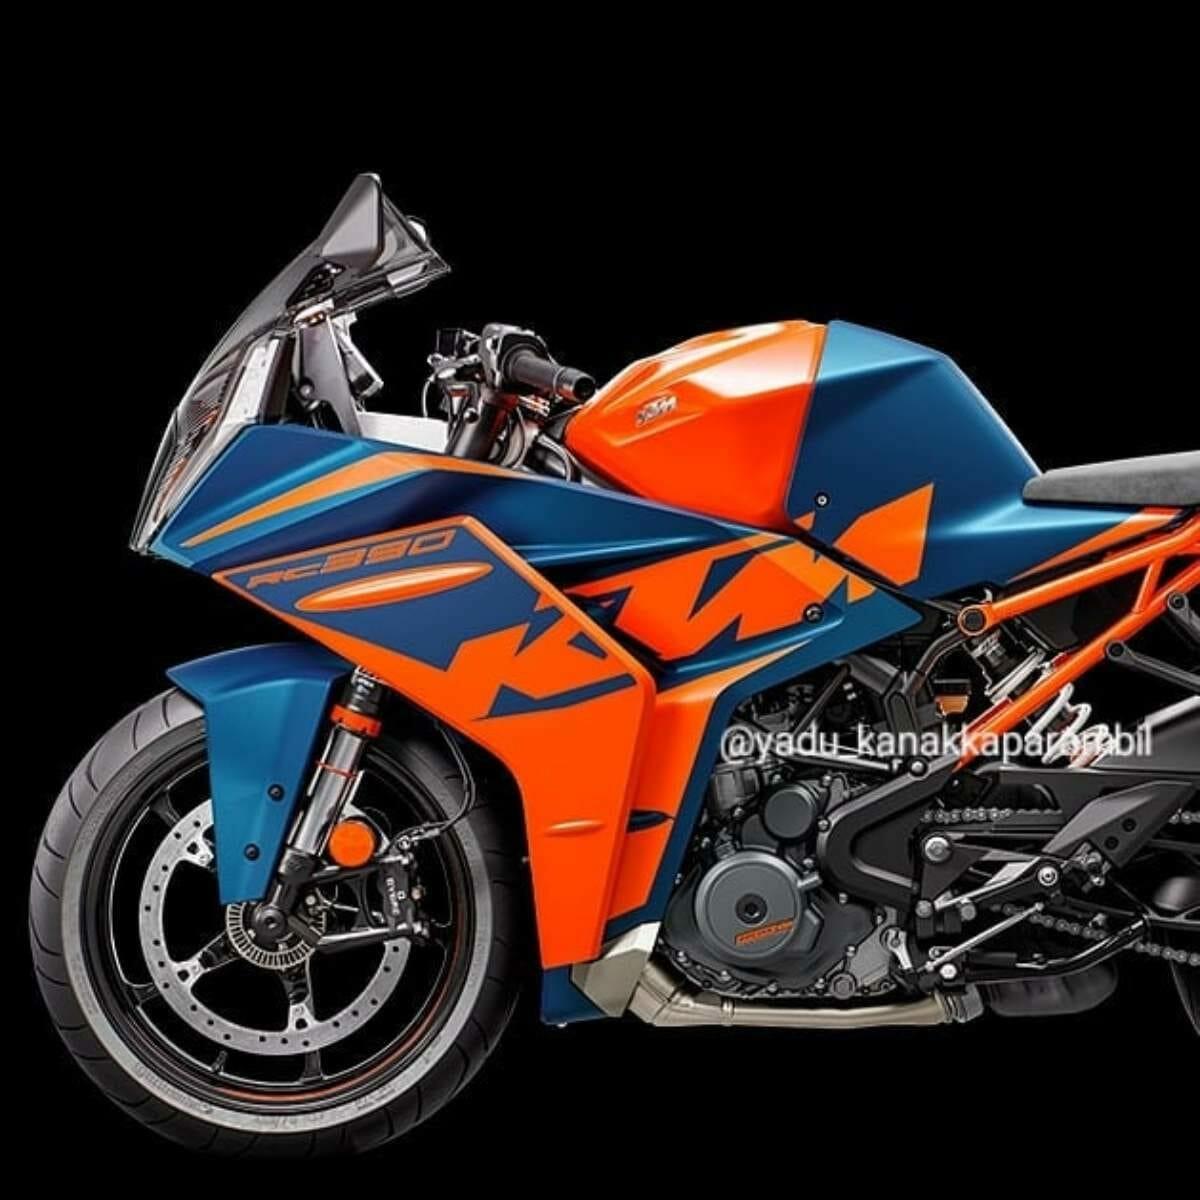 2022 KTM RC 390 Leaked (3)